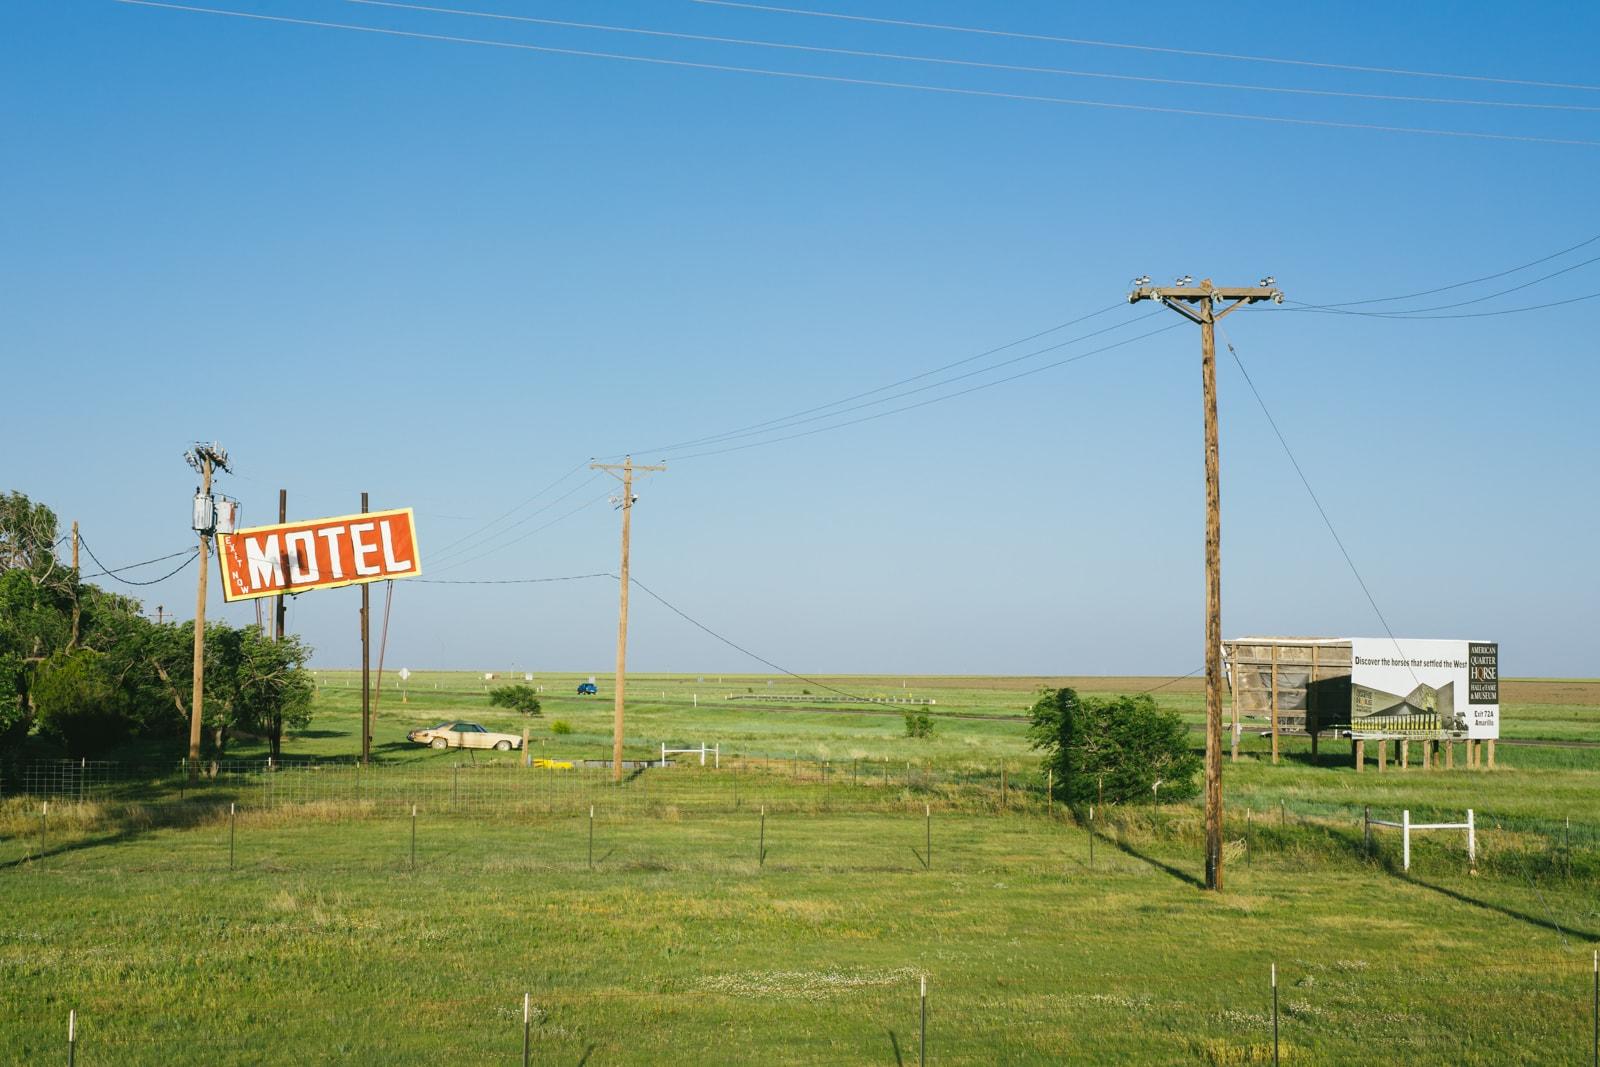 Vintage motel sign in Adrian, Texas